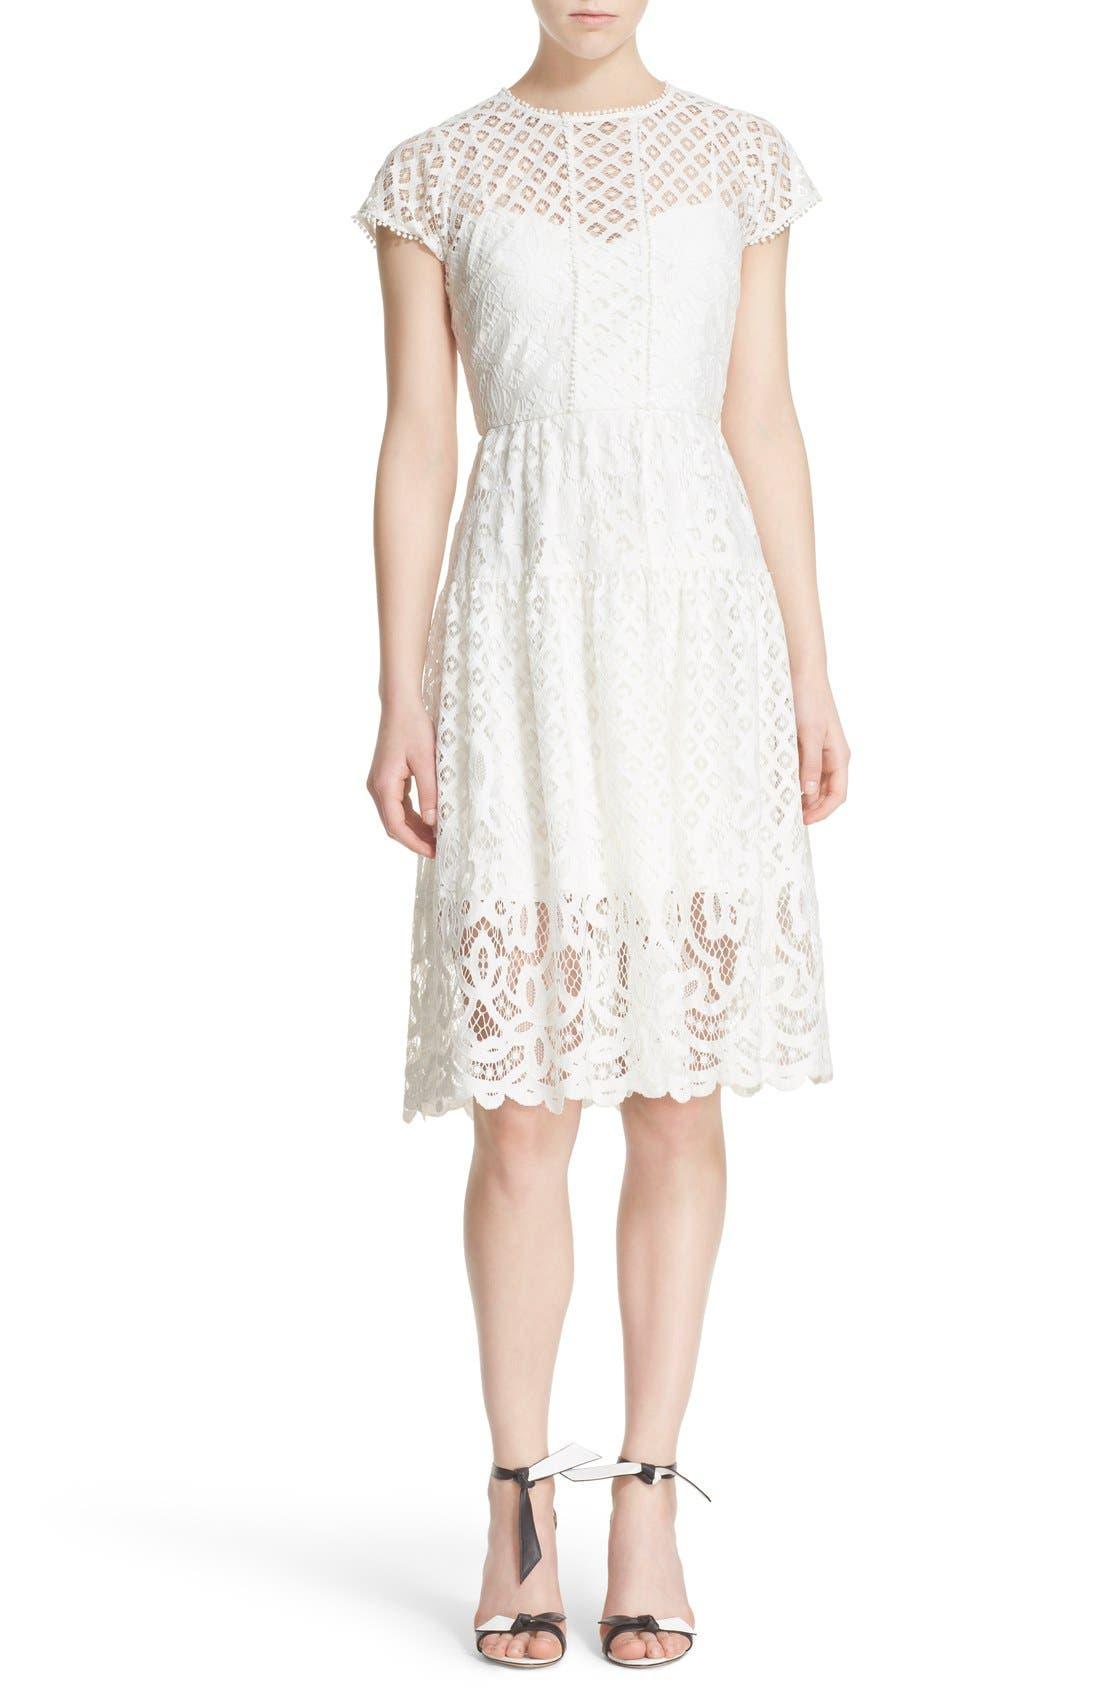 Alternate Image 1 Selected - Parker 'Talulah' Lace Fit & Flare Dress